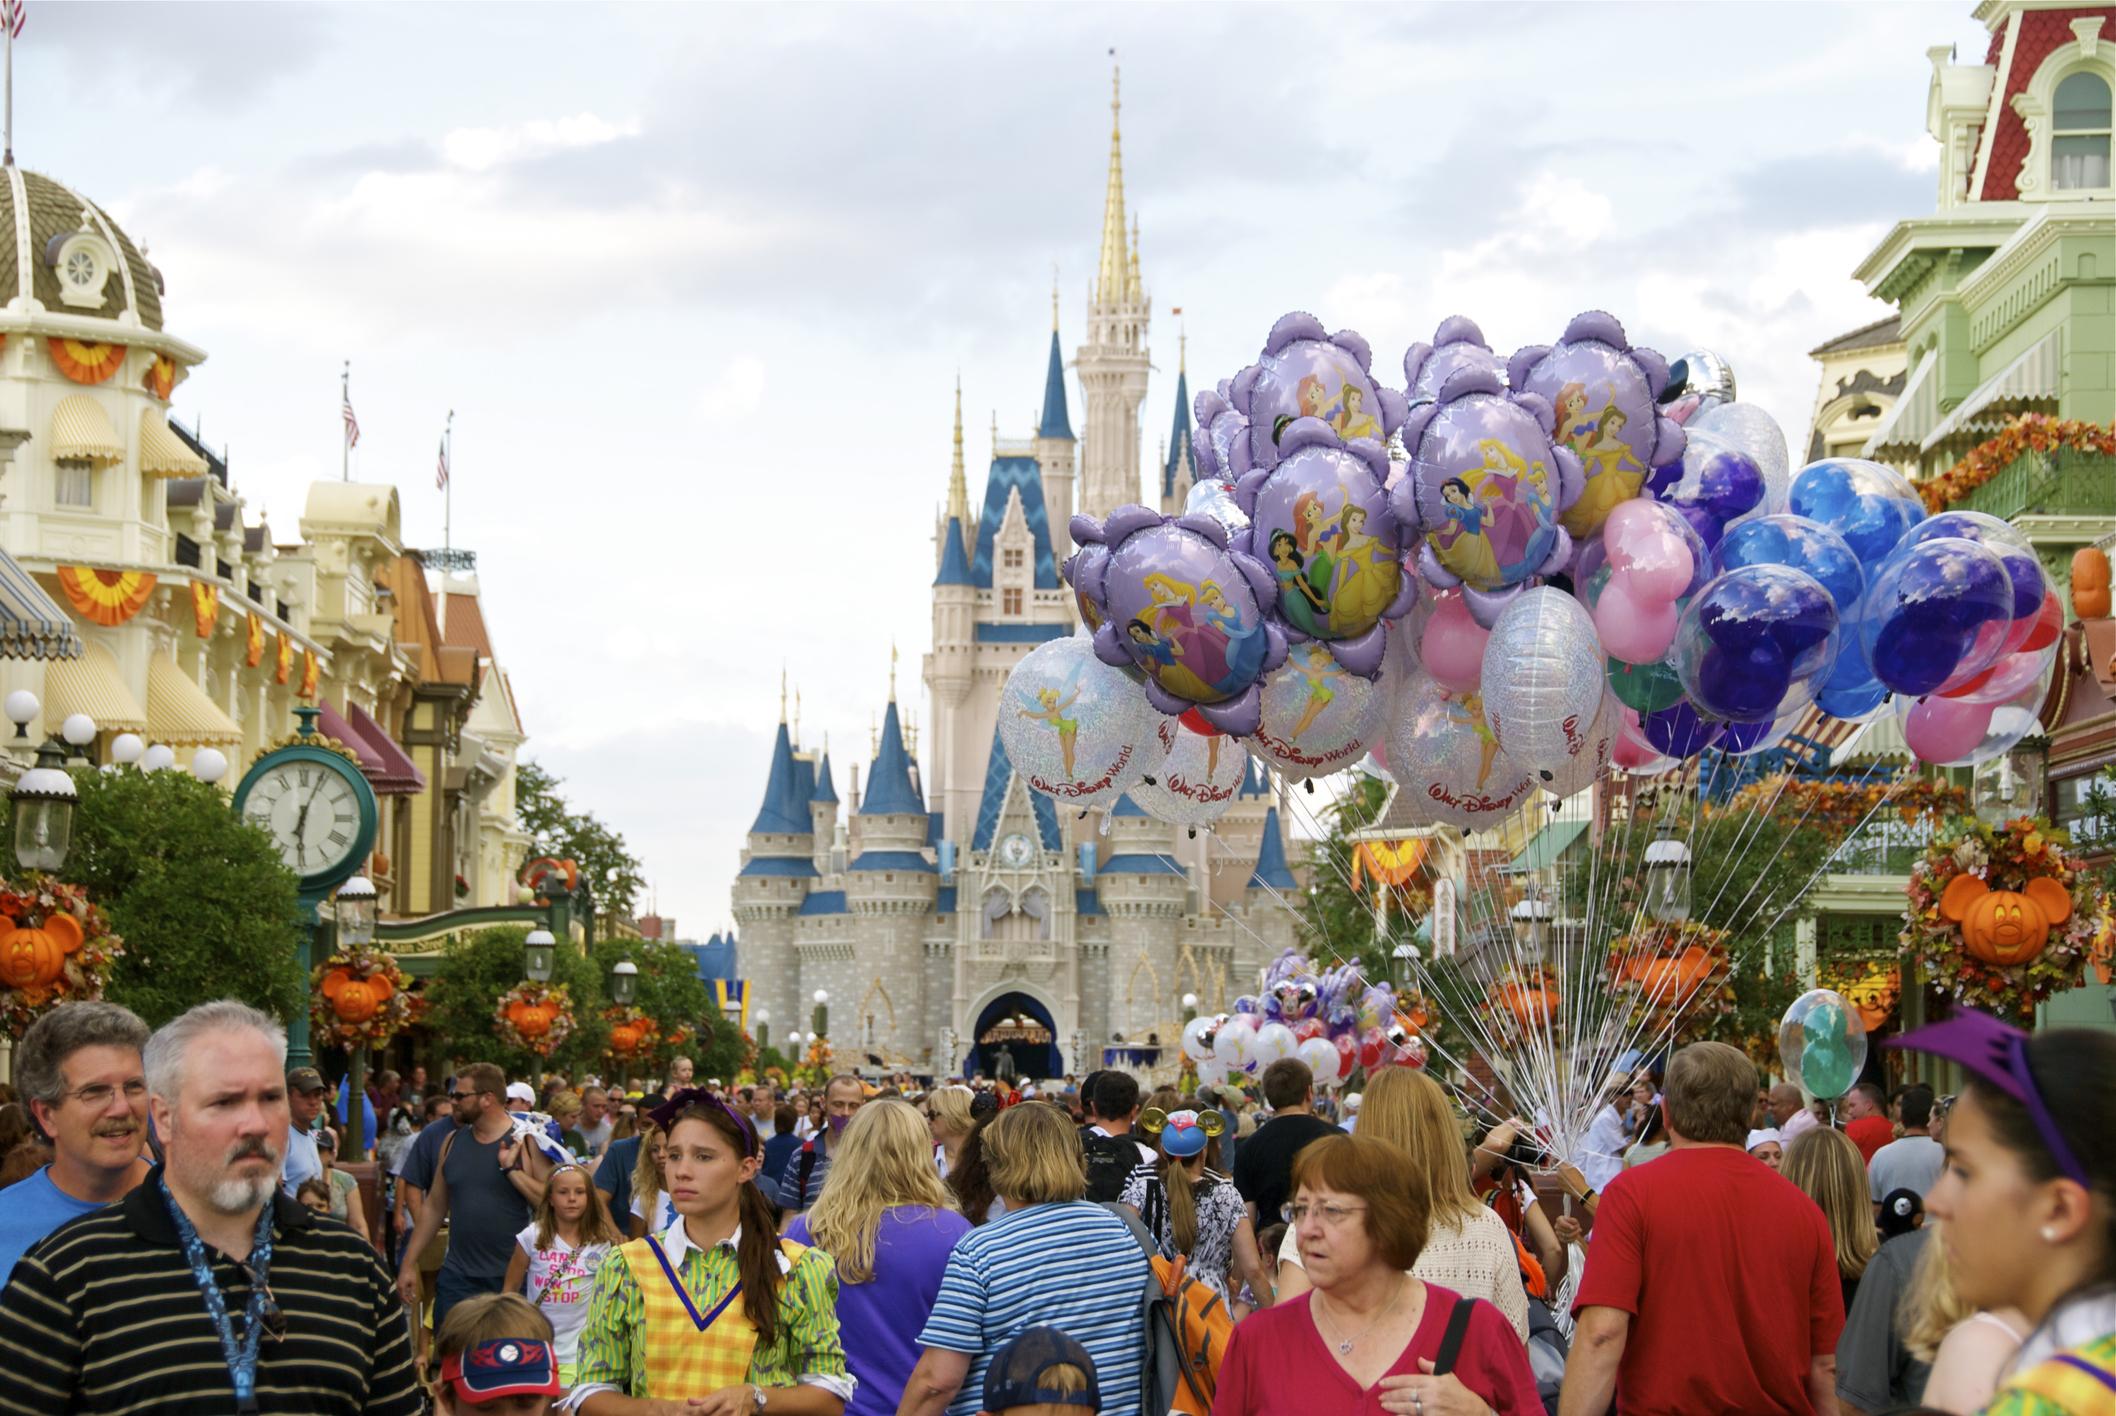 crowds-Disney.jpg?mtime=20181003122641#asset:103392